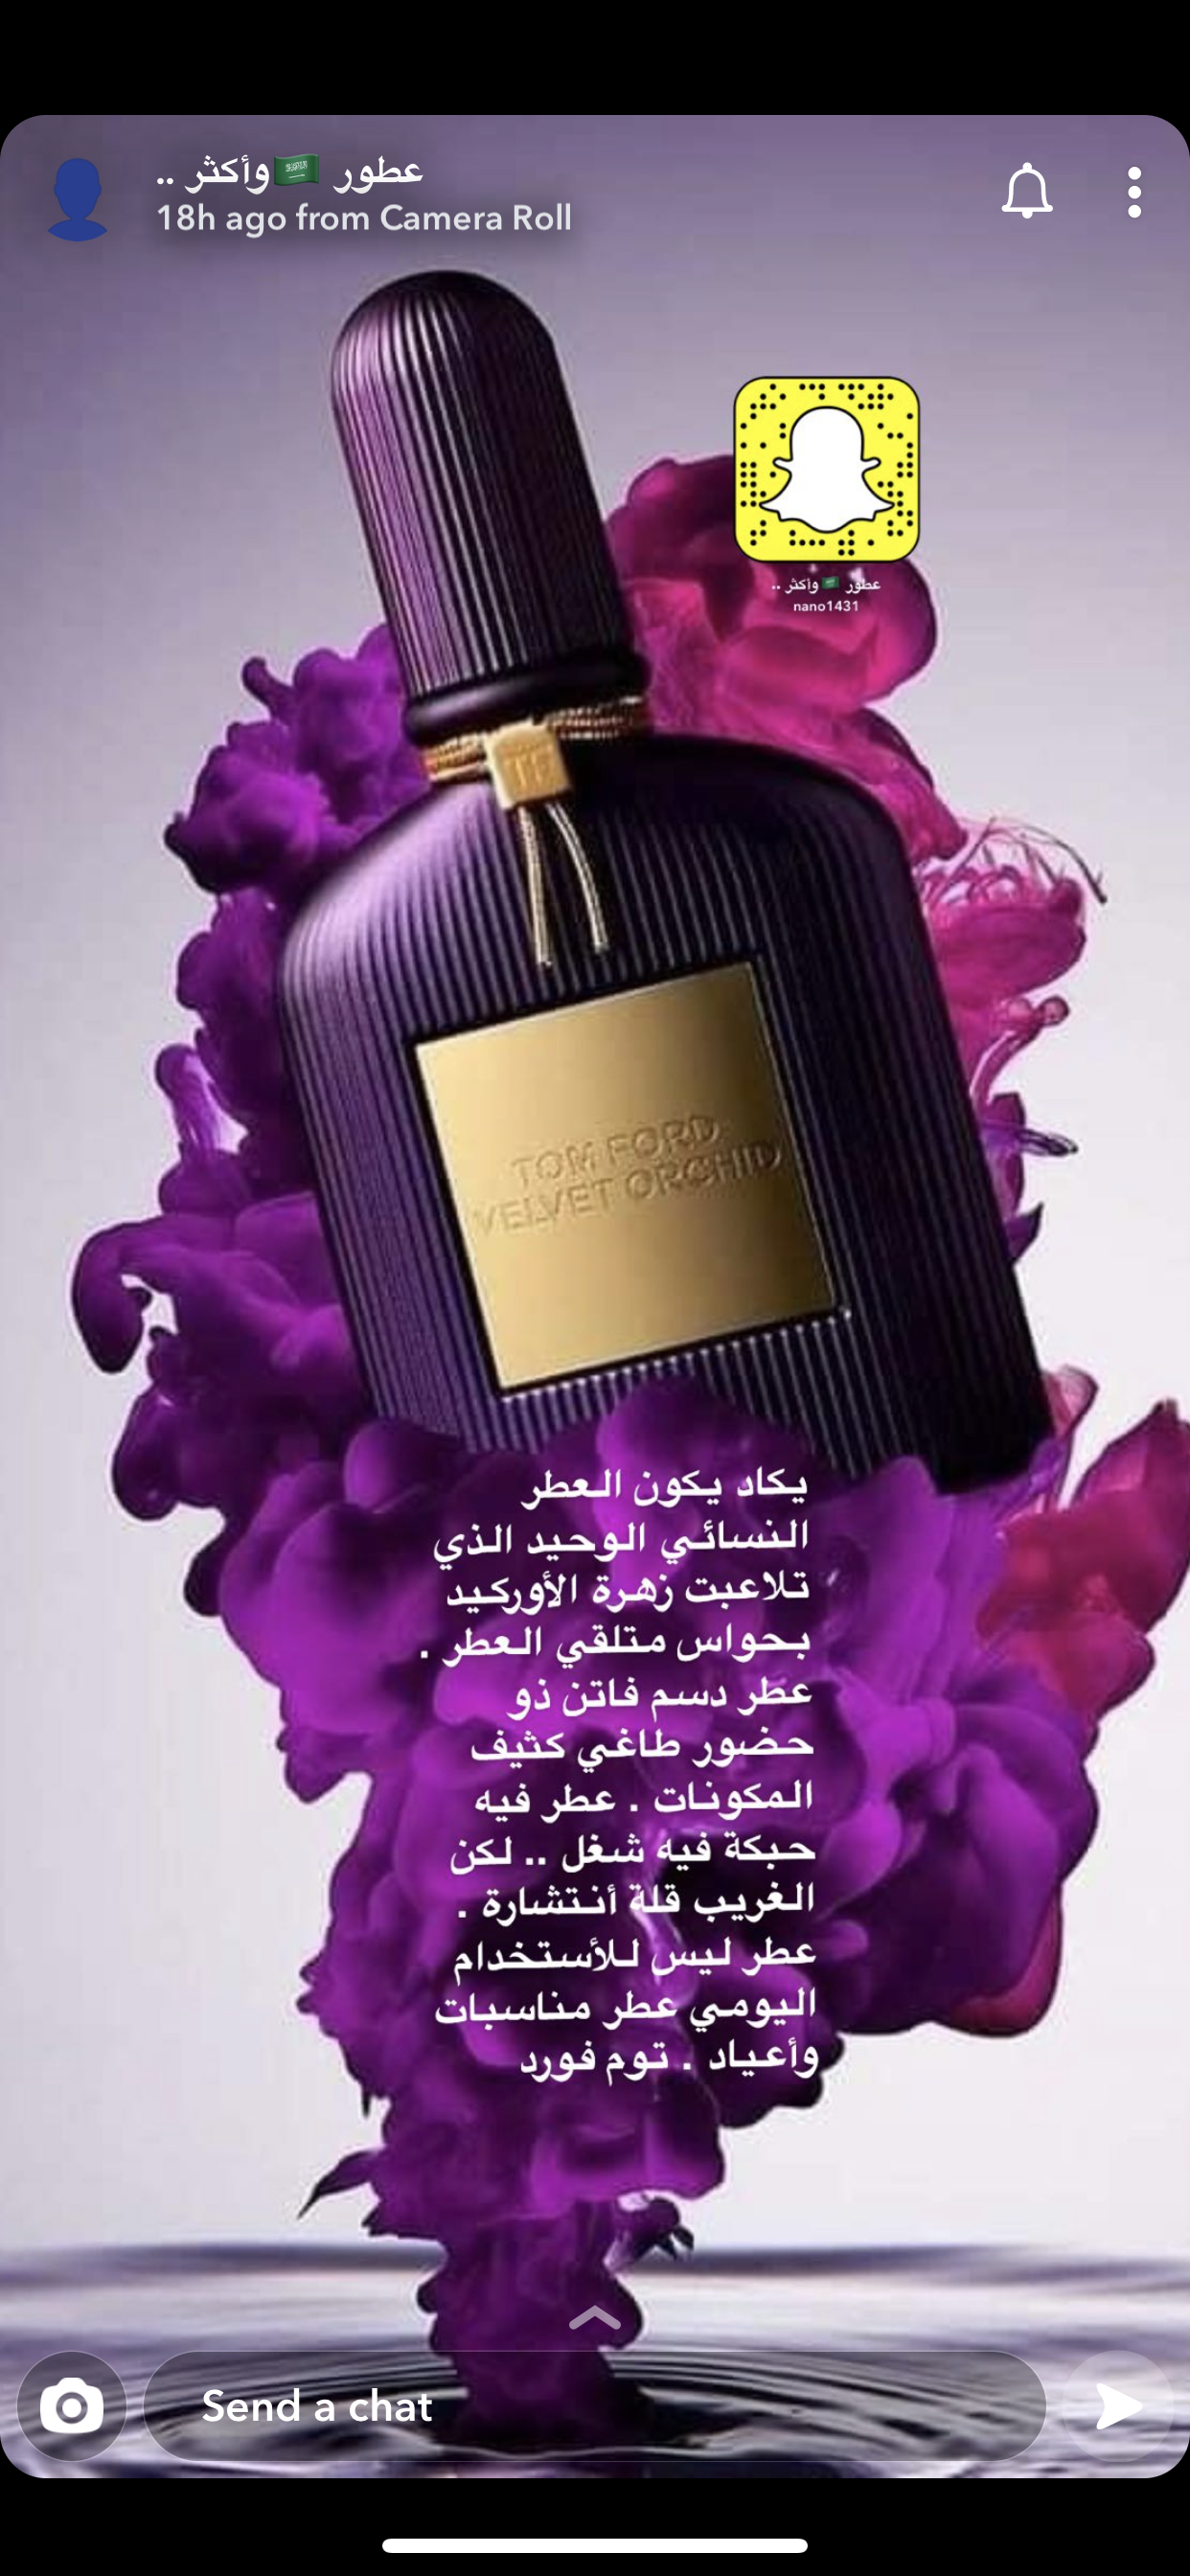 Pin By Samar Anan On عطور فرنسية In 2020 Beauty Perfume Lovely Perfume Perfume